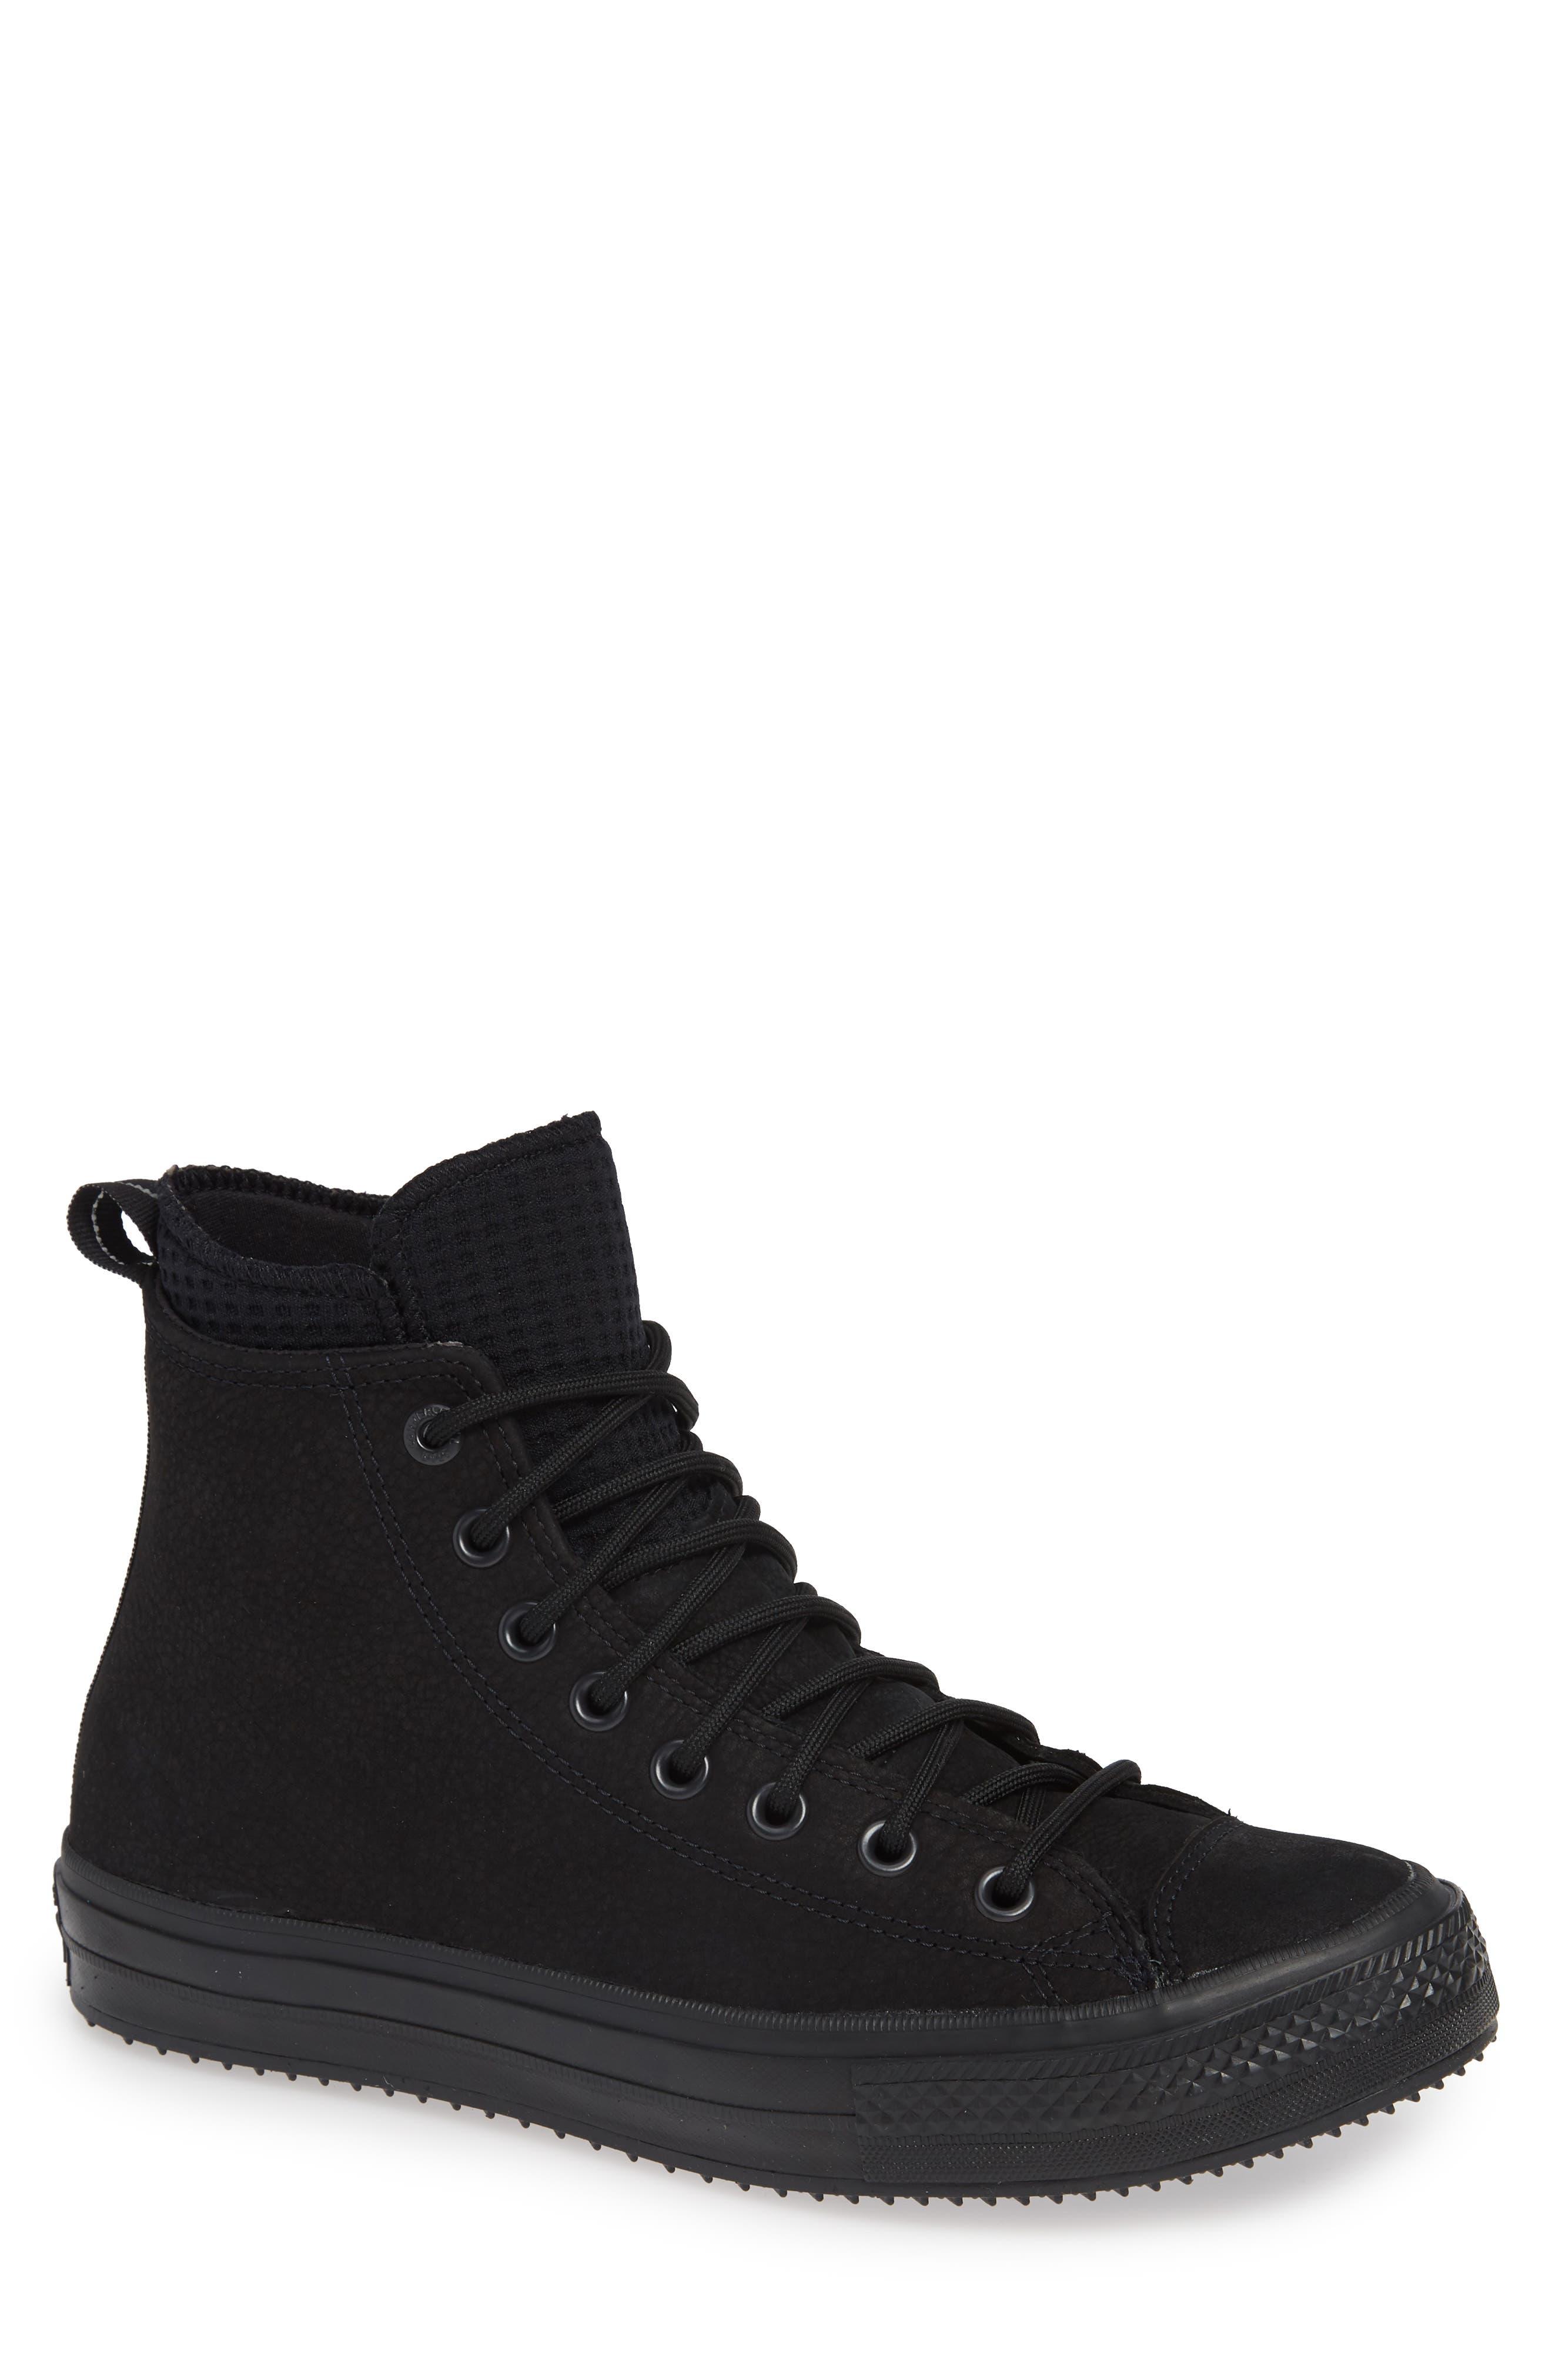 CONVERSE, Chuck Taylor<sup>®</sup> All Star<sup>®</sup> Counter Climate Waterproof Sneaker, Main thumbnail 1, color, BLACK/ BLACK/ BLACK